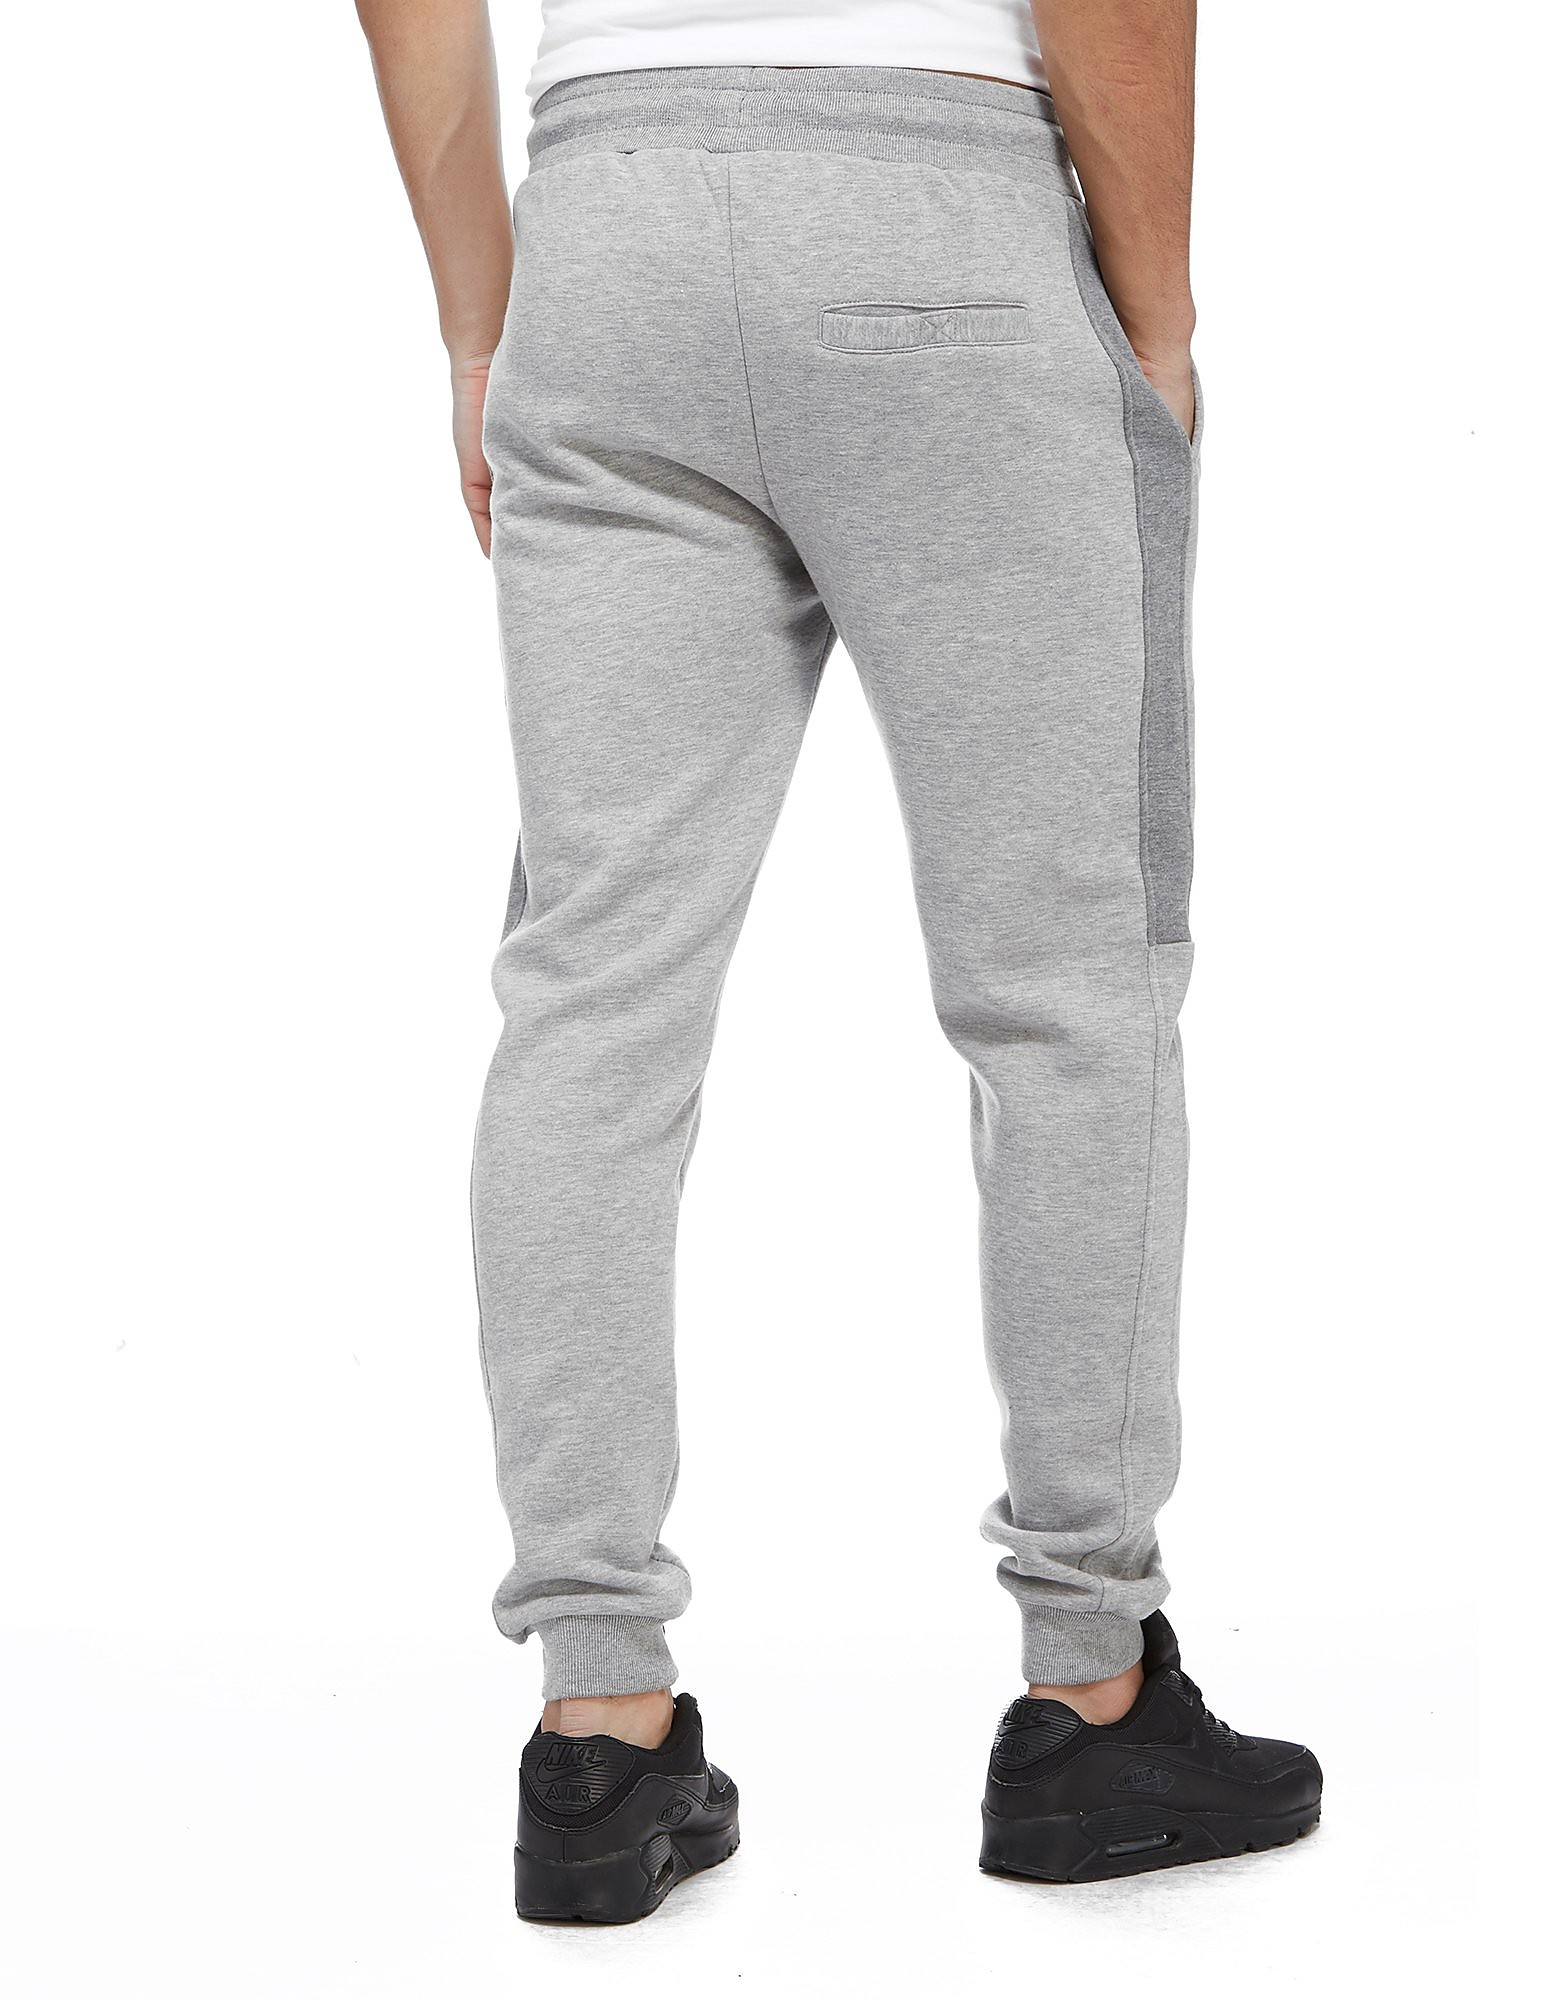 Fila Fosteroni Fleece Pants